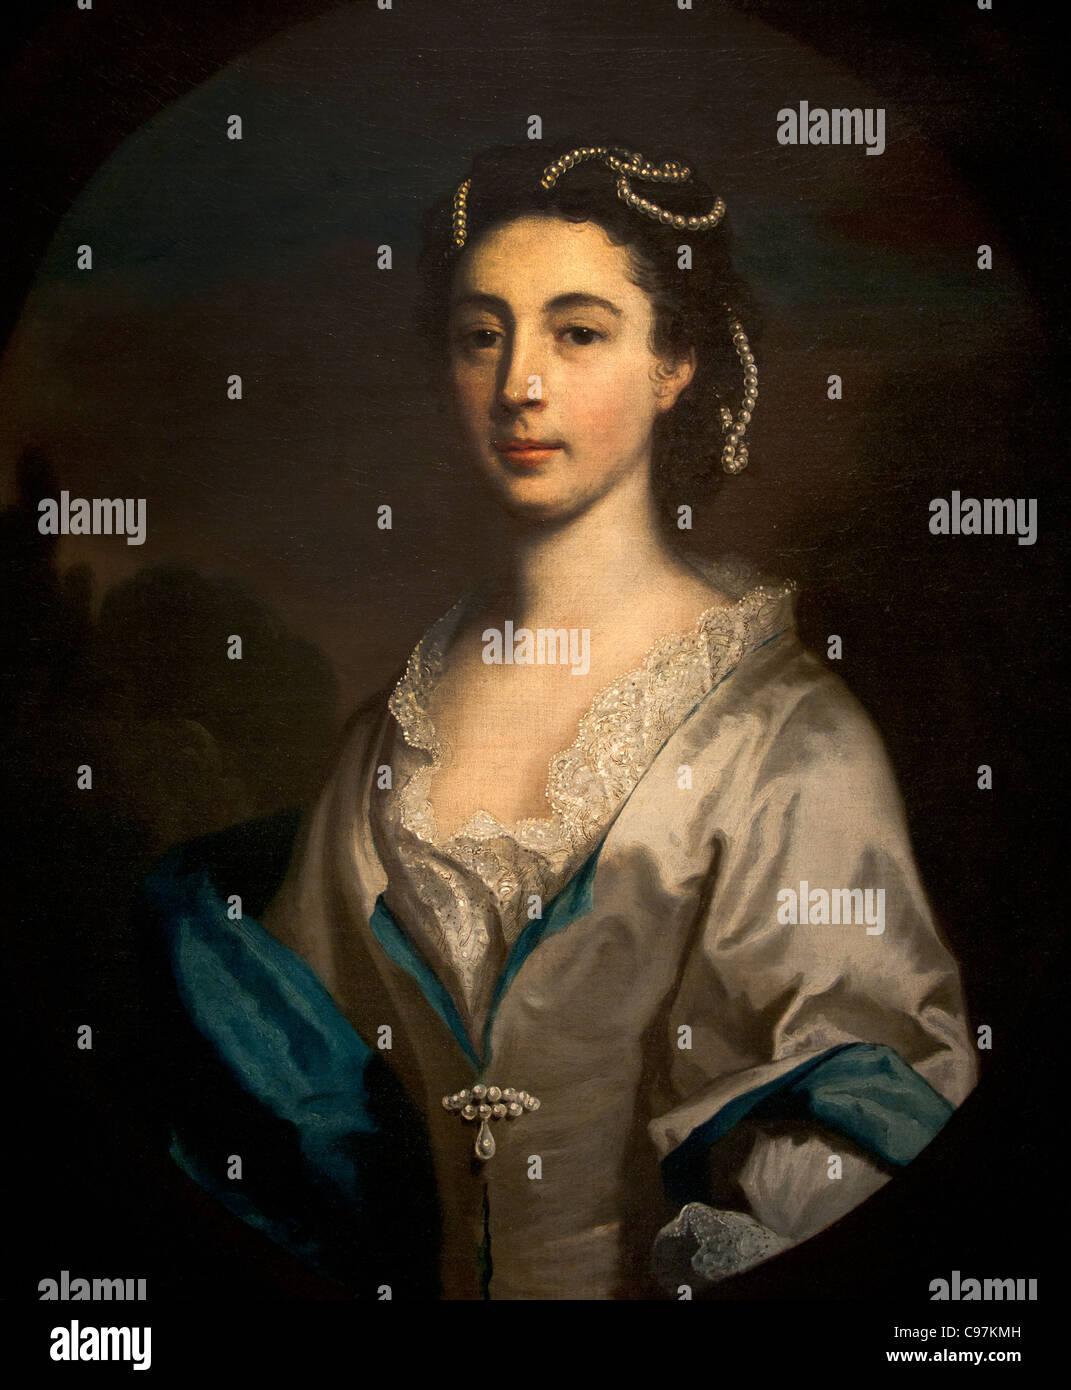 Frances West 1742 by Joseph Highmore British Stock Photo